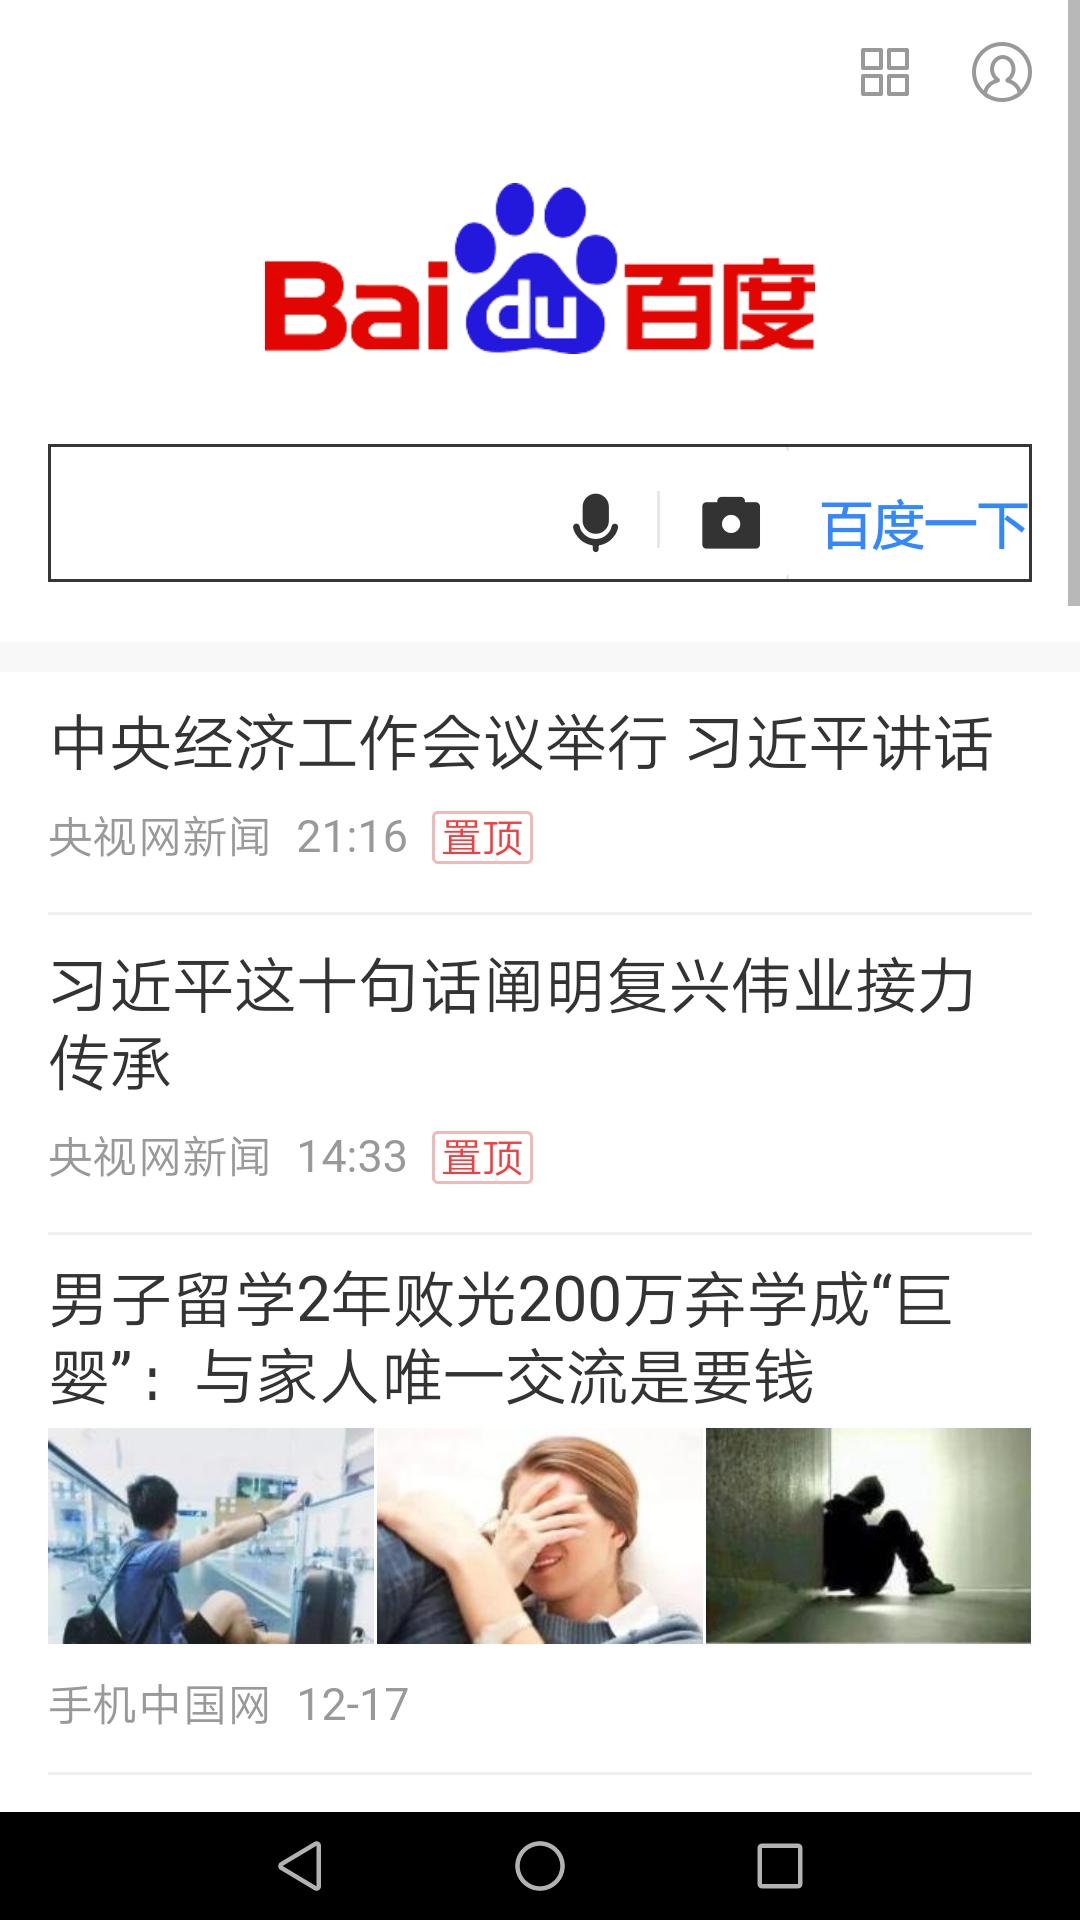 Android Baidu Screen 2